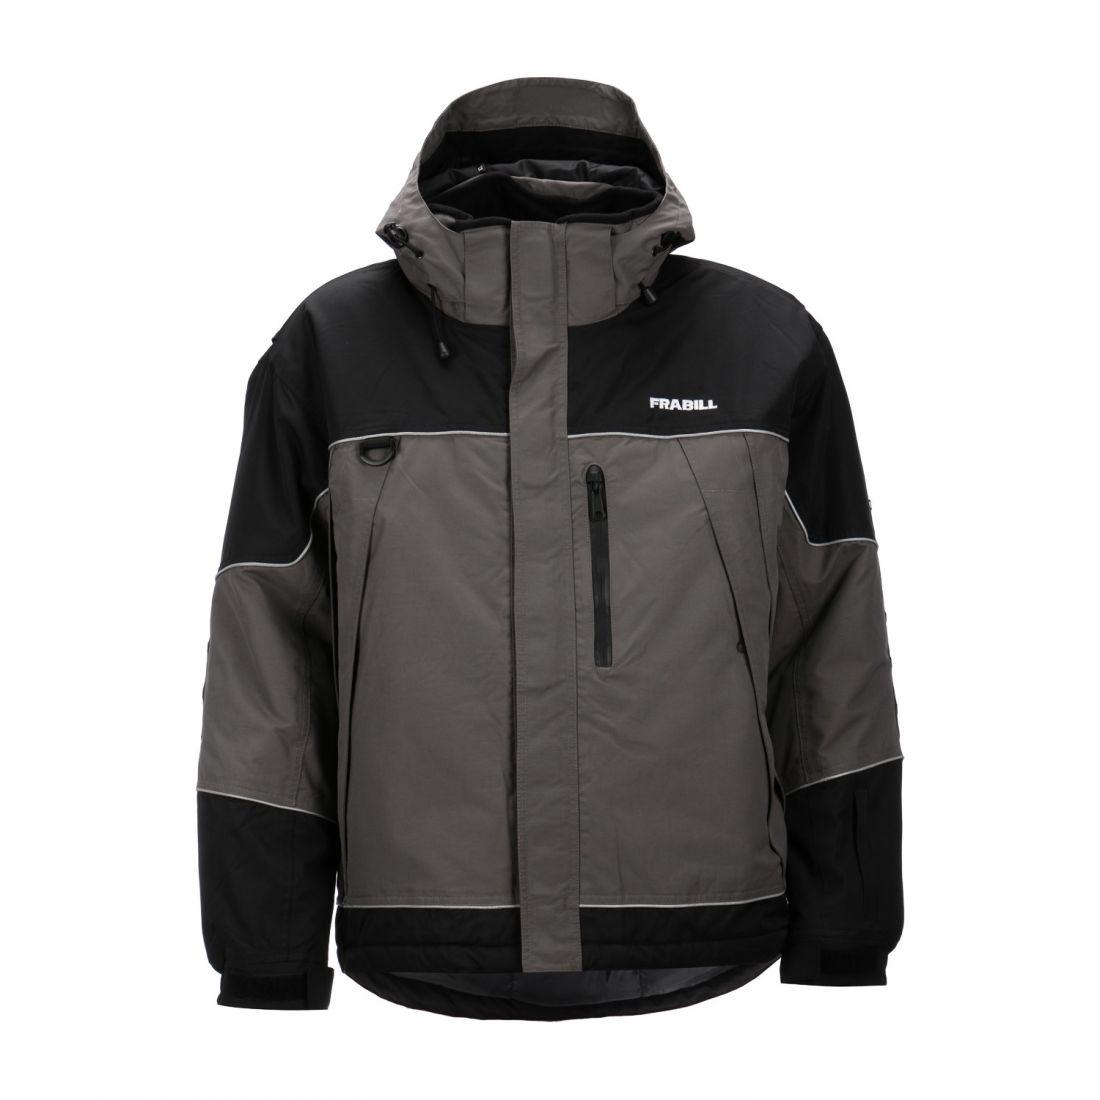 Куртка зимняя FRABILL FXE SNOSUIT JACKET GRAY размер L